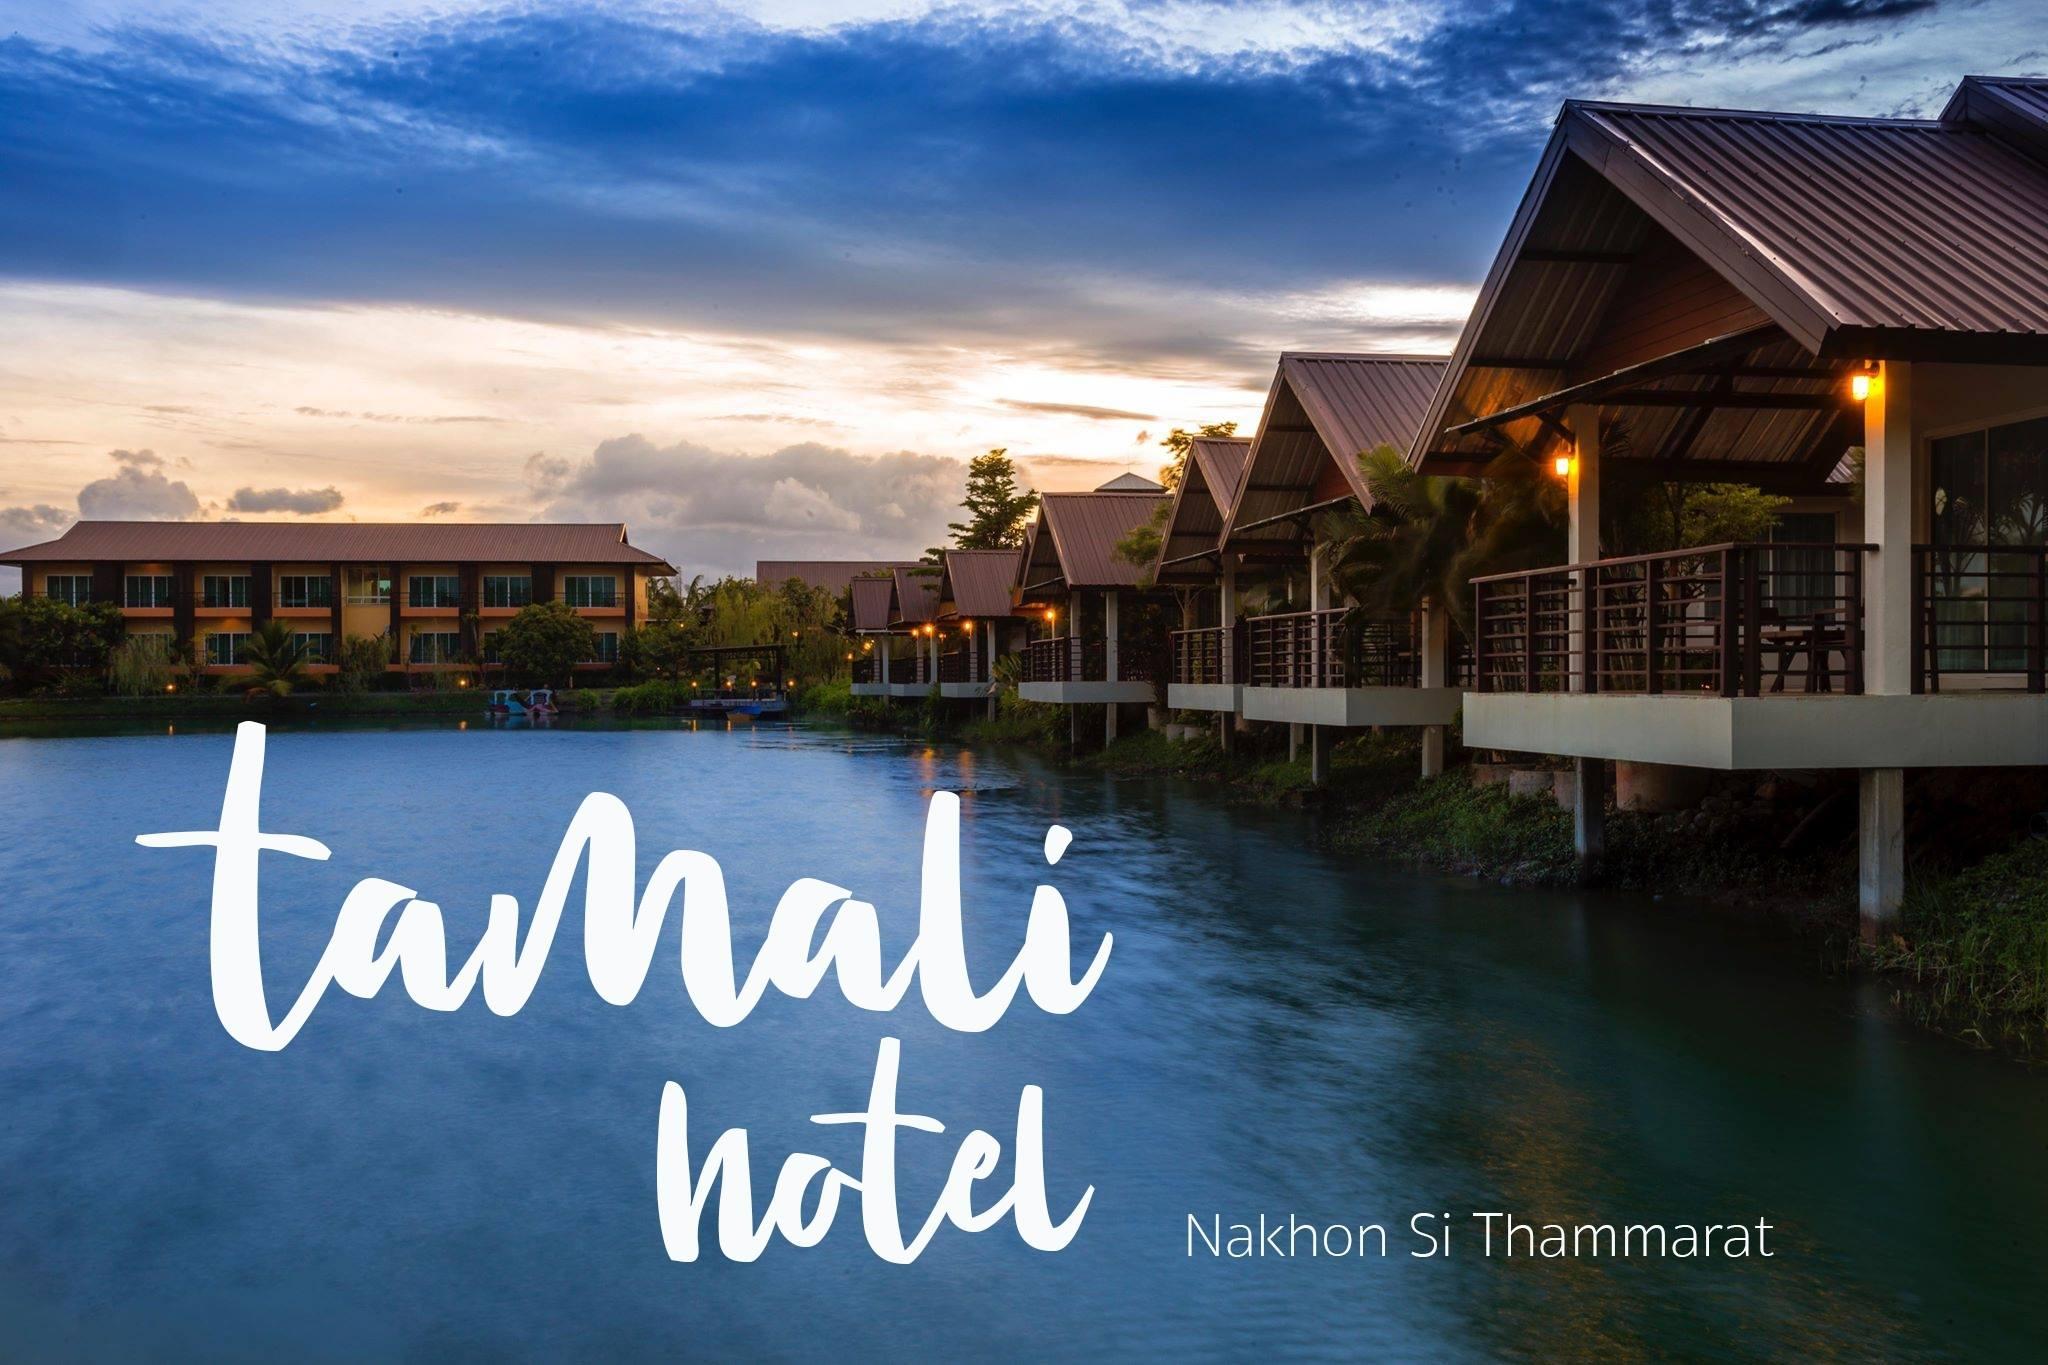 16.-Tamali-Hotel checkin,nakhonsithammarat,ของกิน,ร้านอาหาร,จุดเช็คอิน,ที่เที่ยว